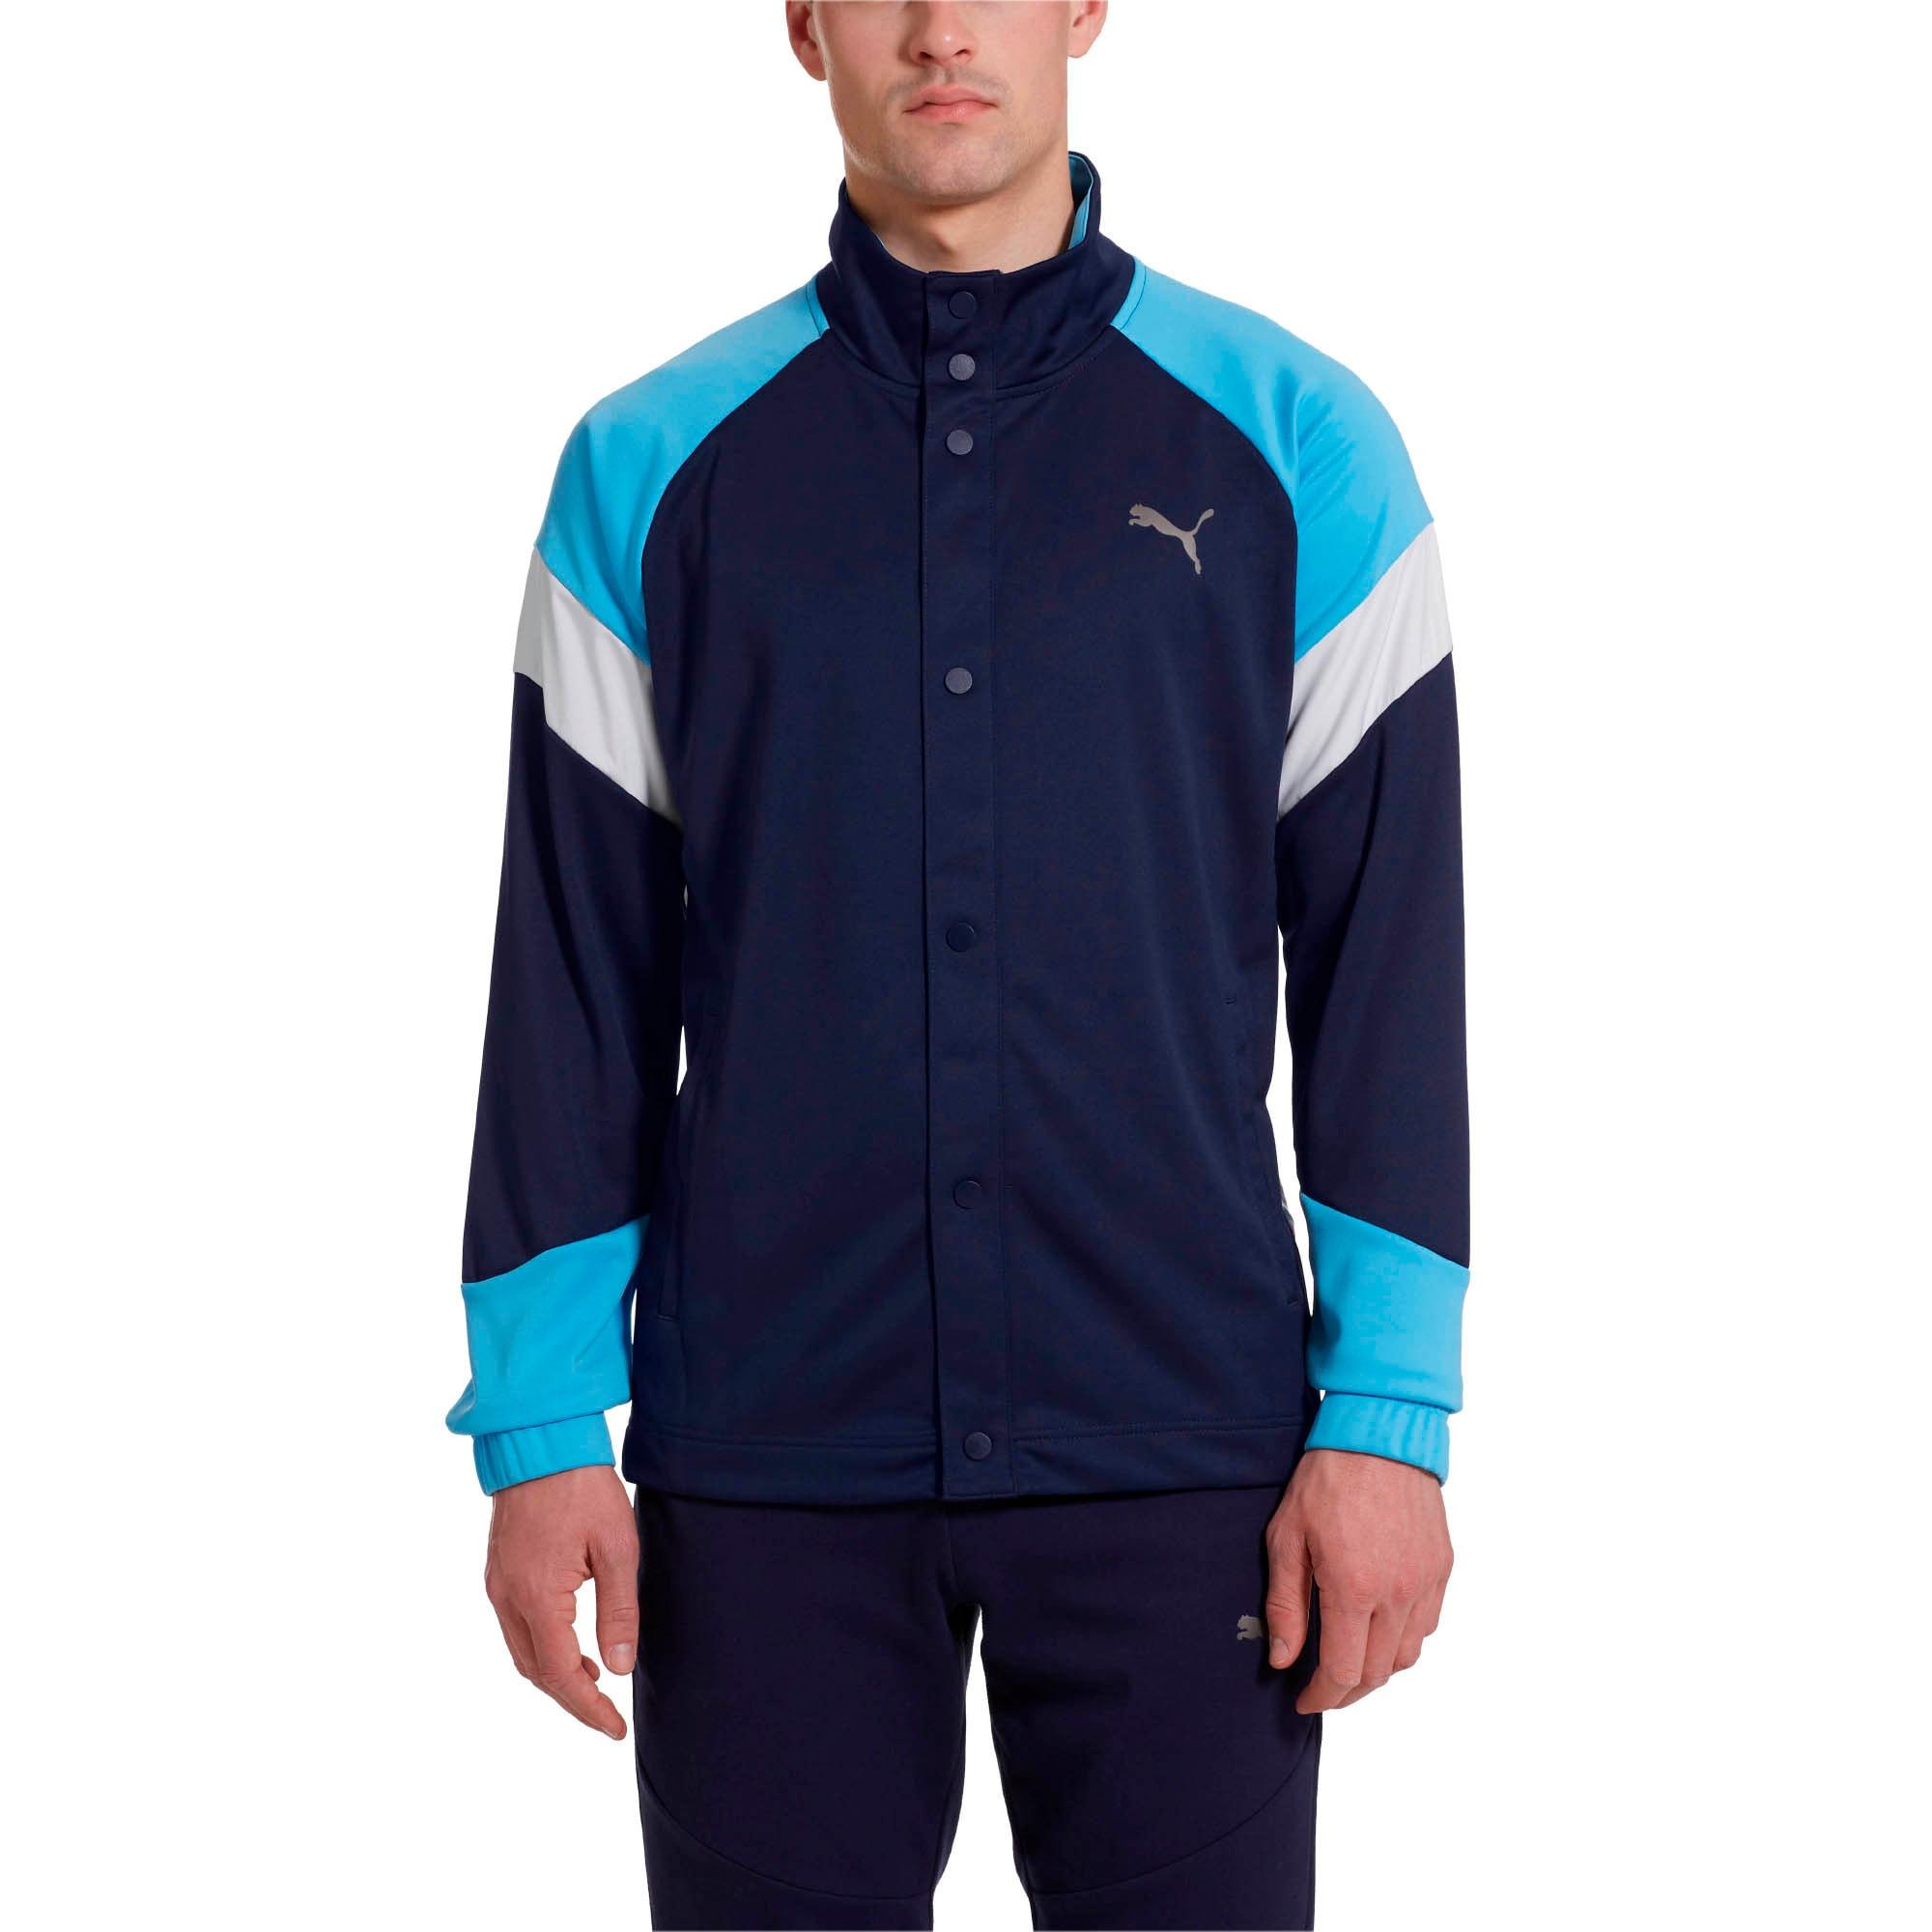 Thumbnail 2 of A.C.E. Men's Track Jacket, Peacoat-Bonnie Blue, medium